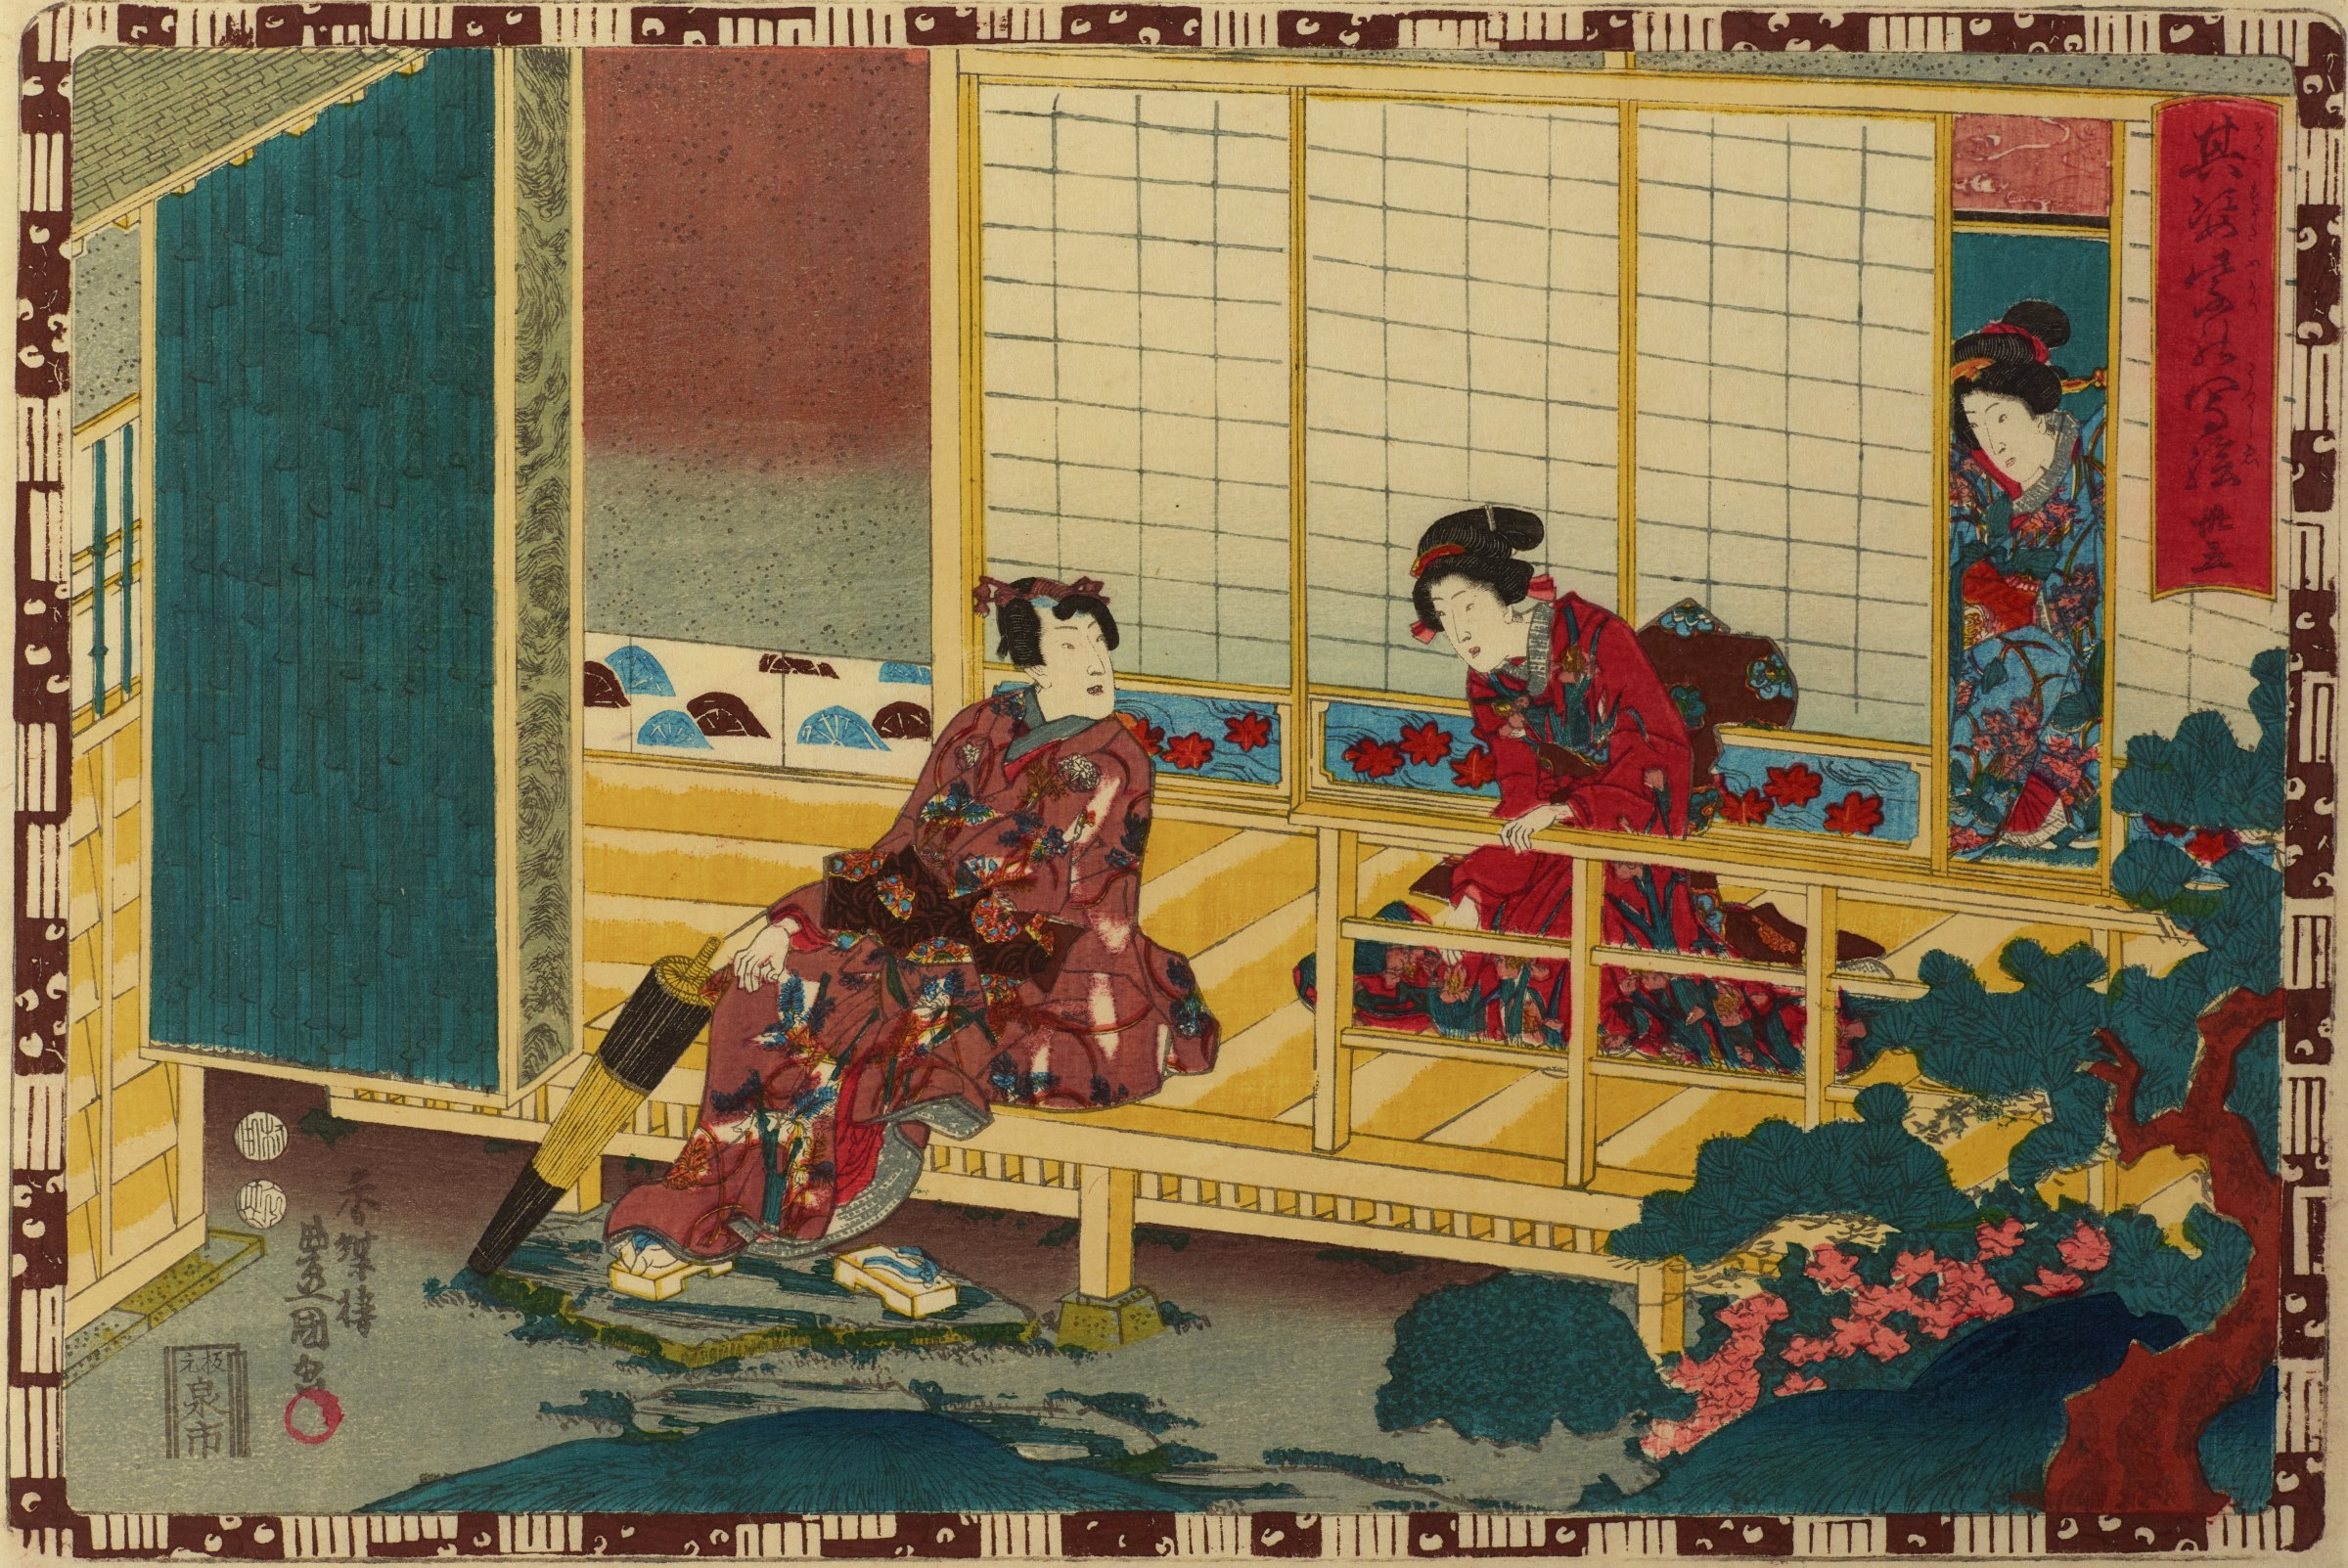 Genji Appearances in Illustration, no. 35, Utagawa Kunisada, ink and color on paper